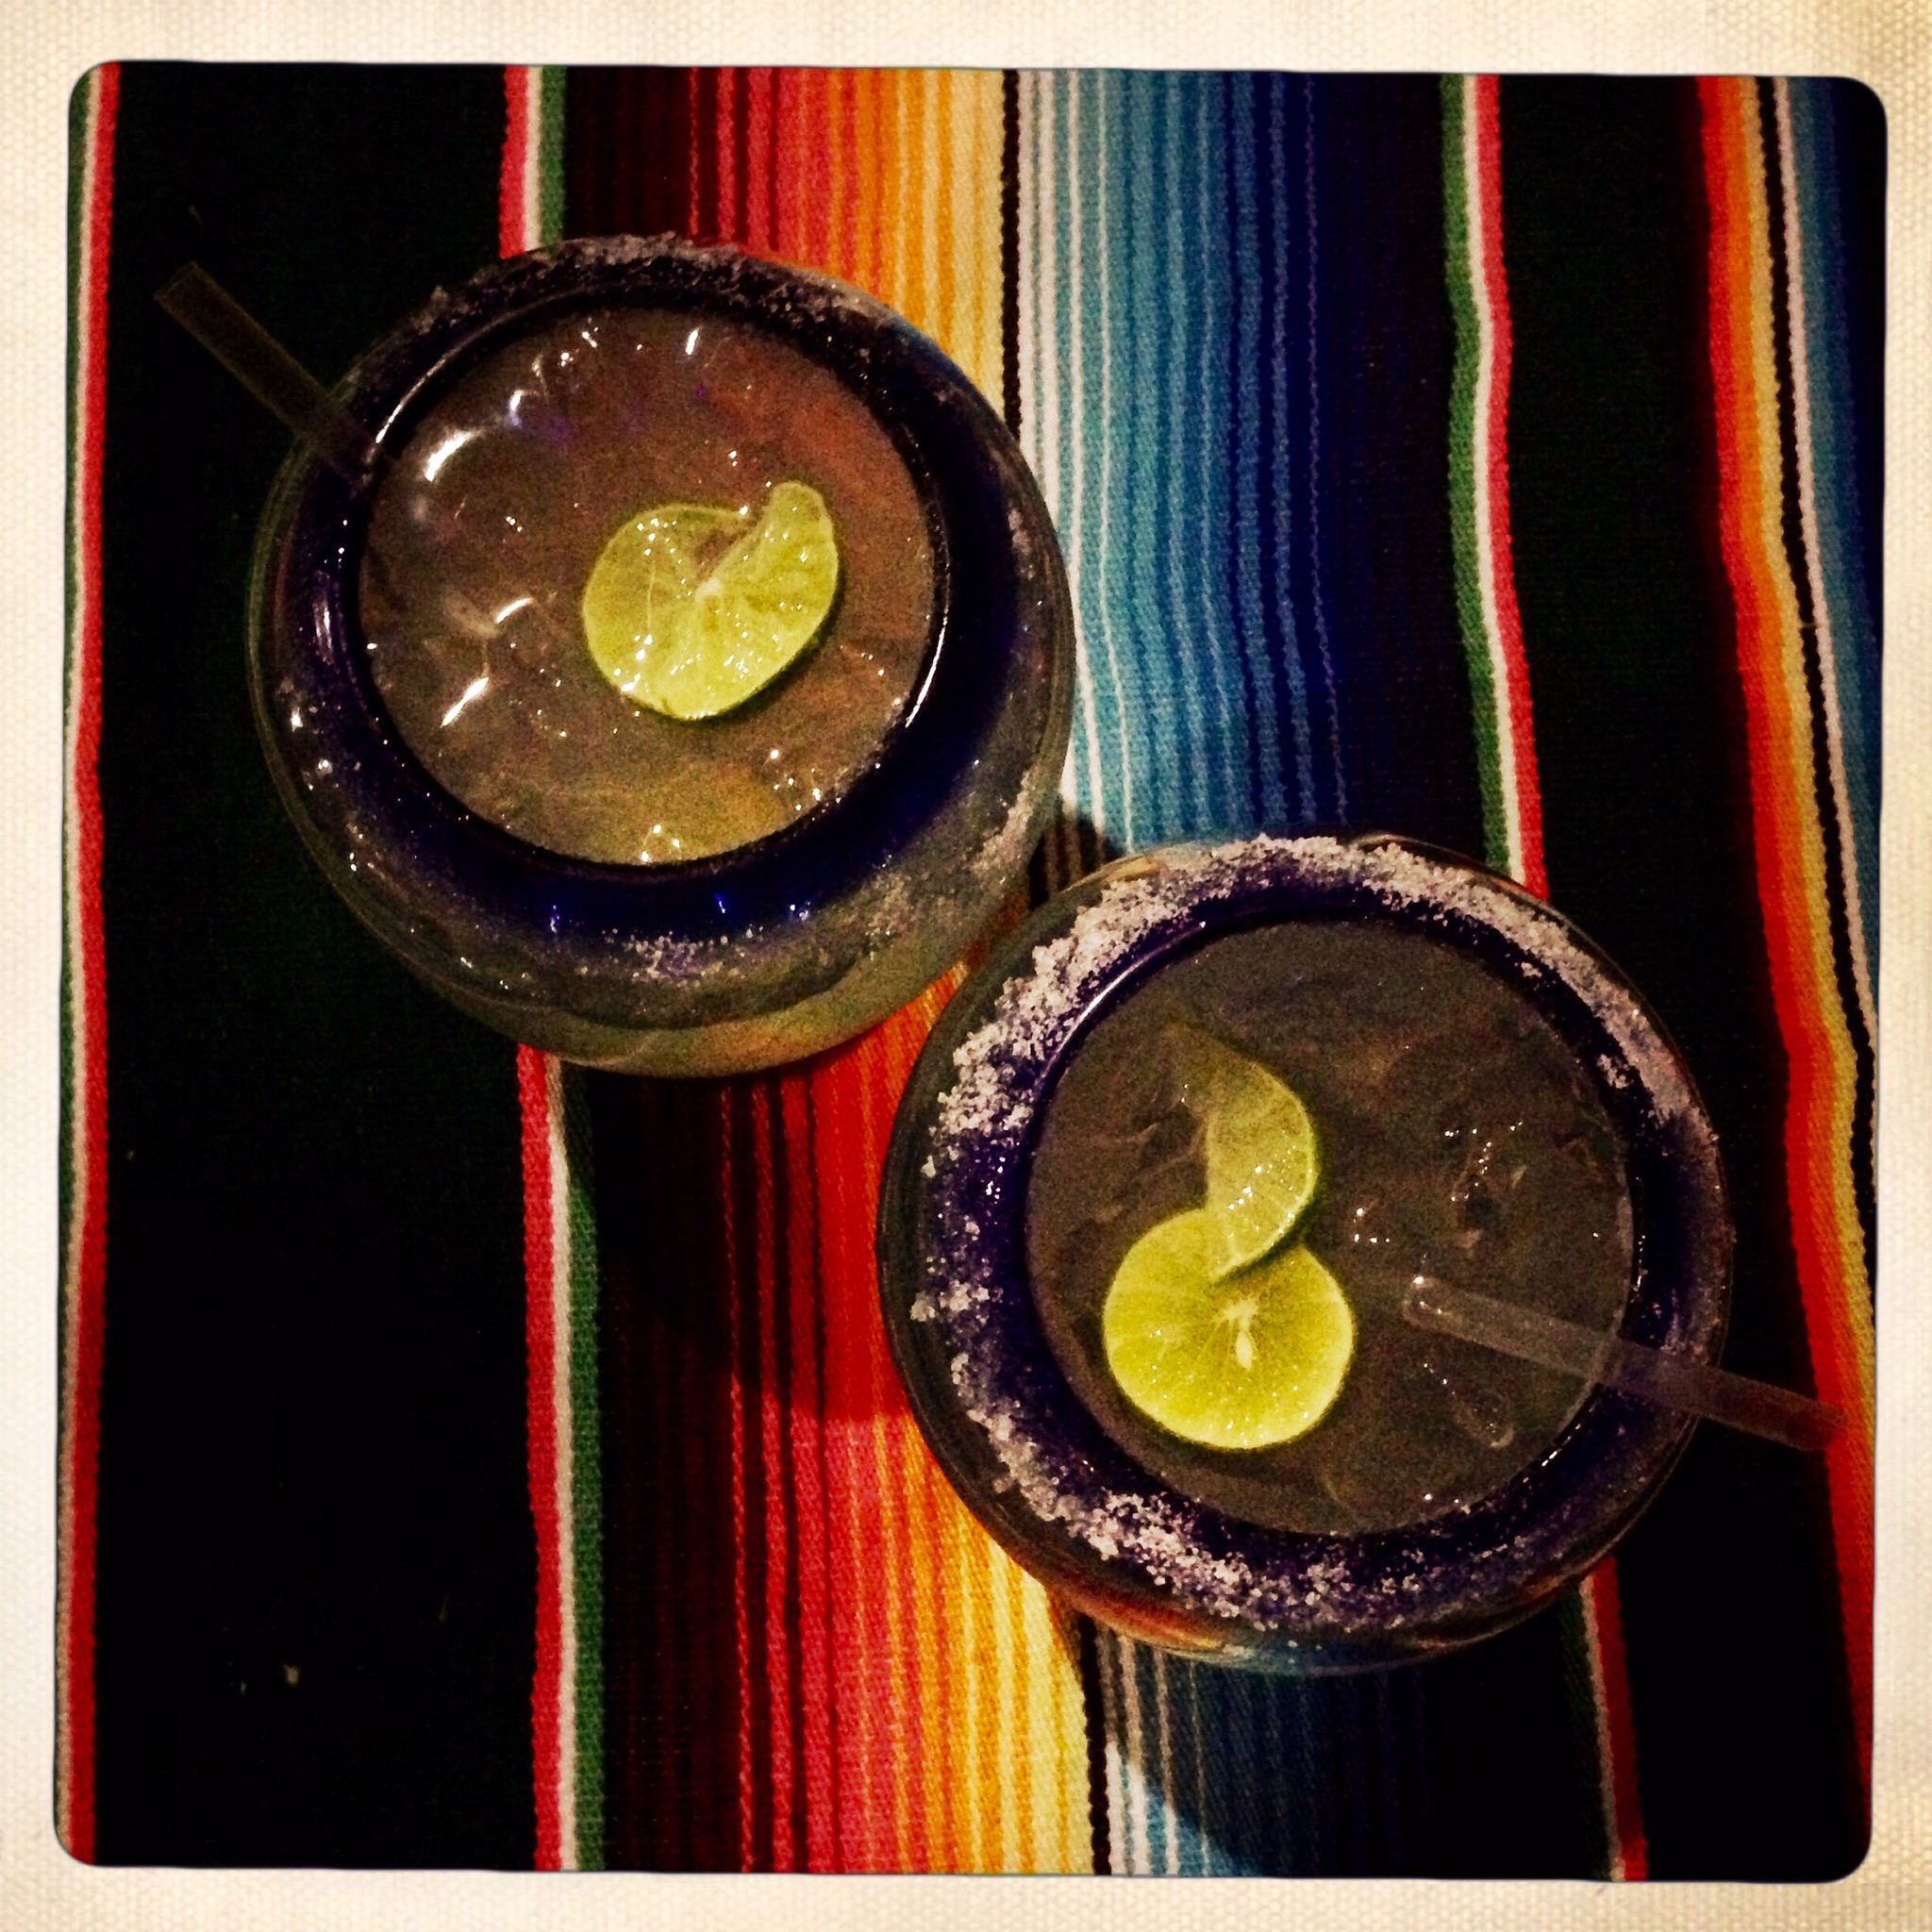 A Caballera margarita is the finest. Photo by Liz Dasilva